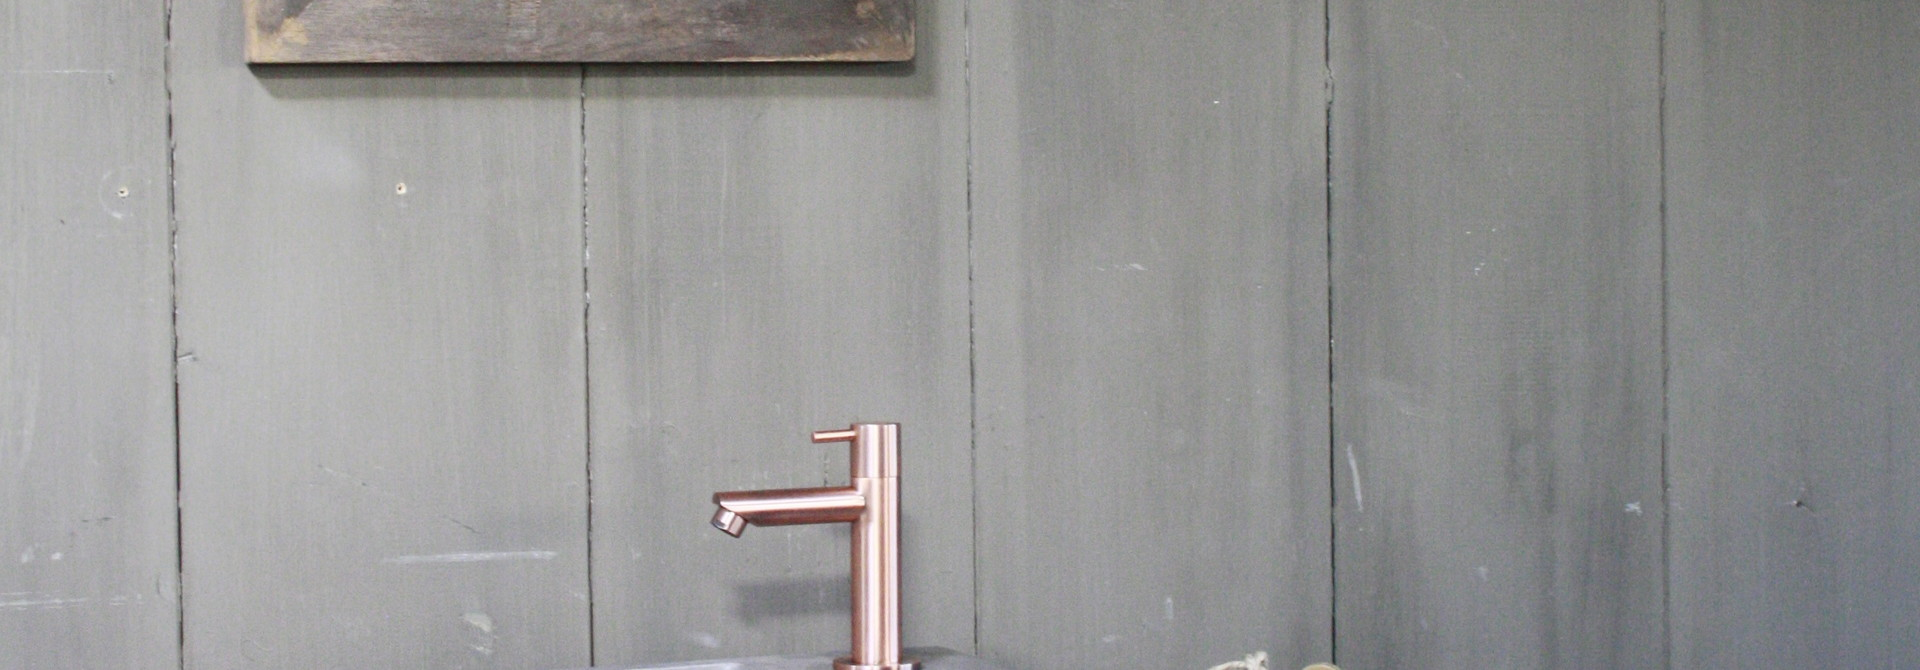 Rosa - Fonteinmeubelset - Beton - Koper